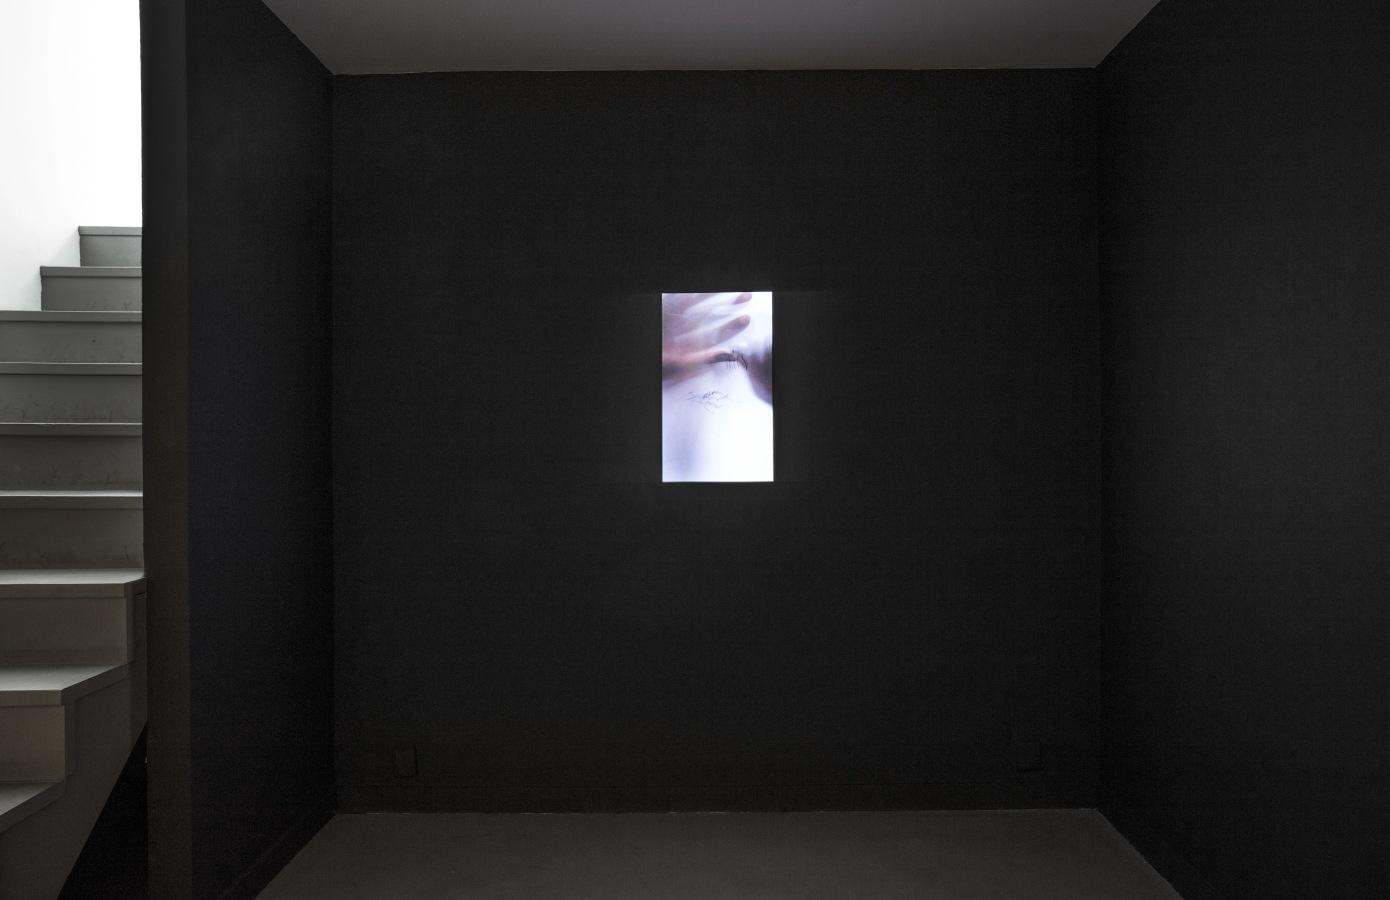 IN BETWEEN THE NIGHT SLEEPWALKERS, Meiro Koizumi,